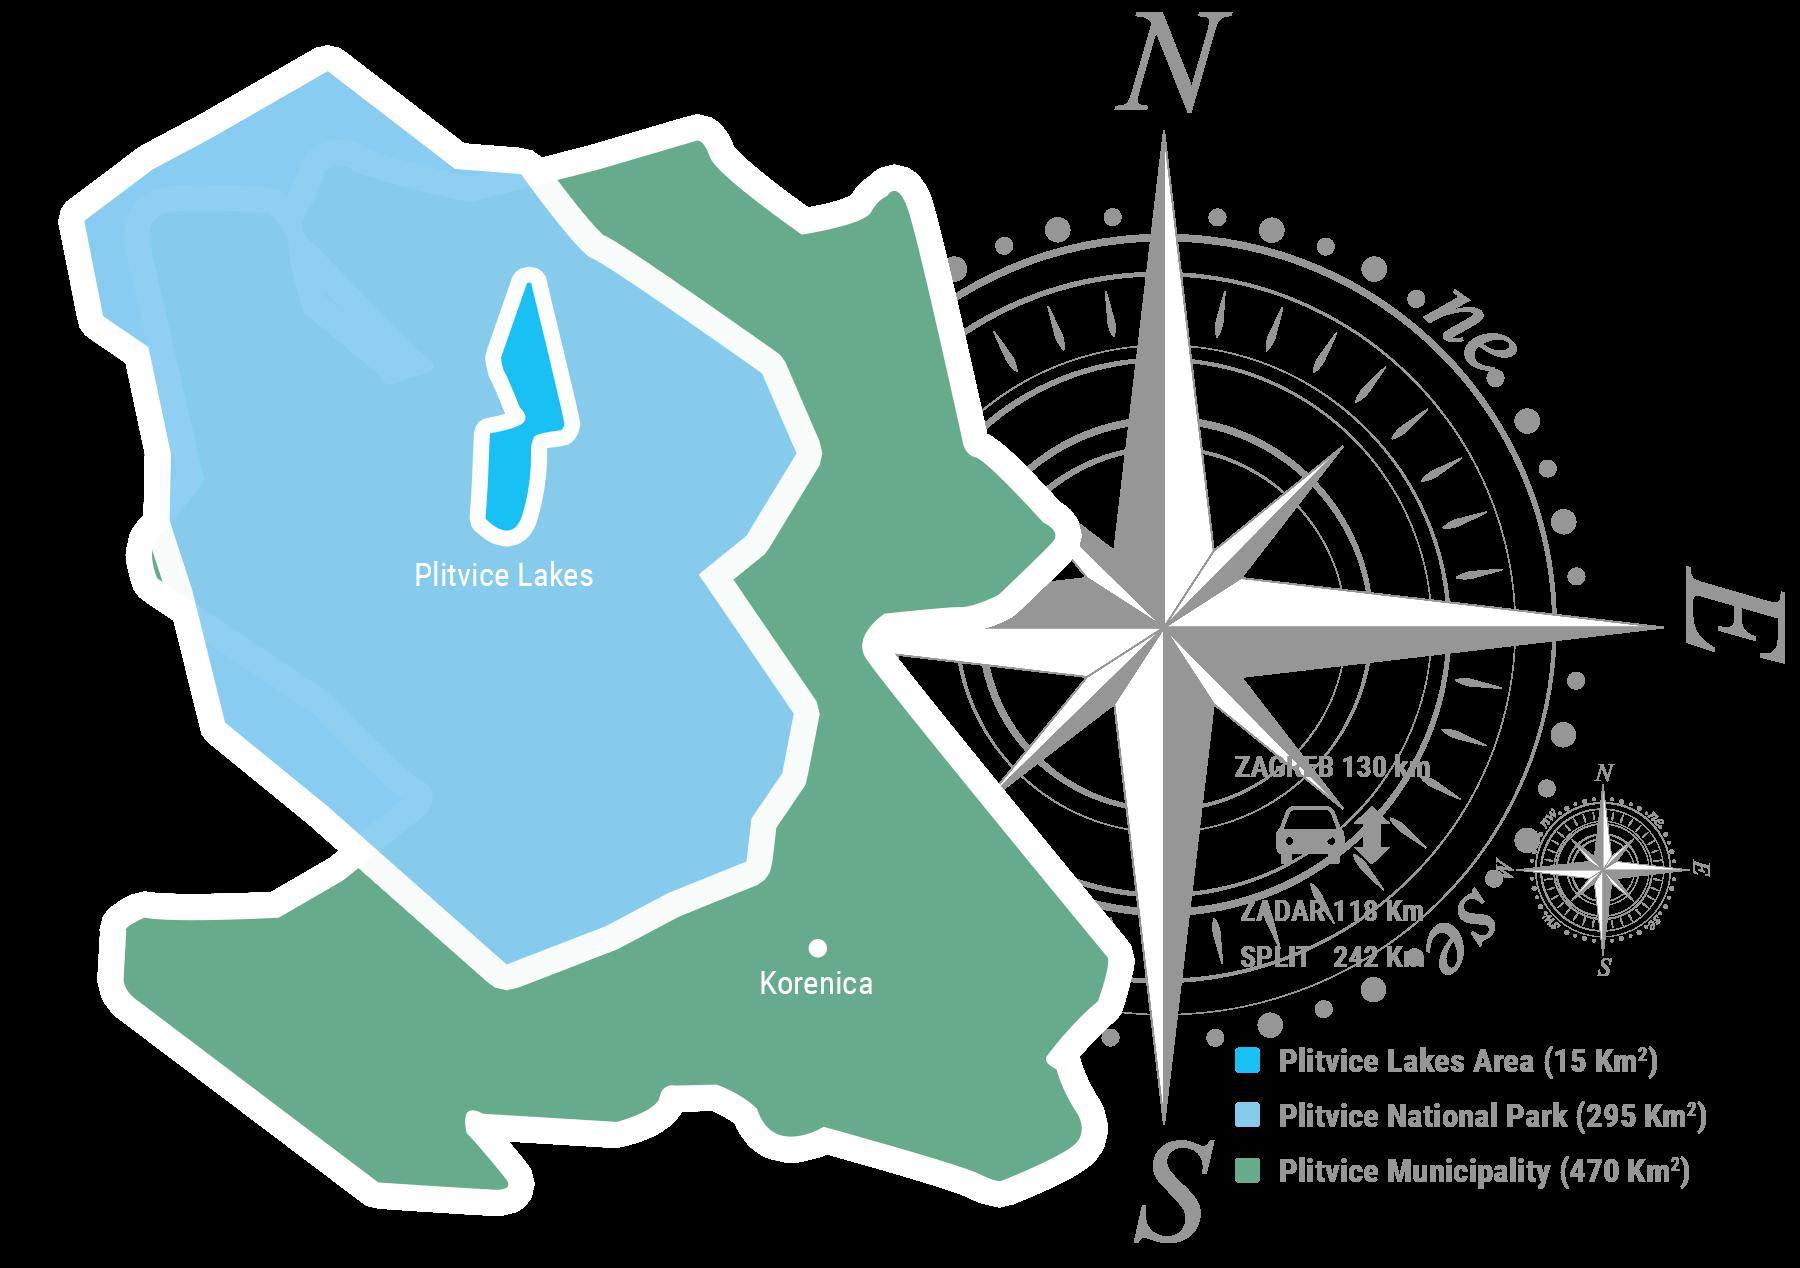 Plitvice County Map